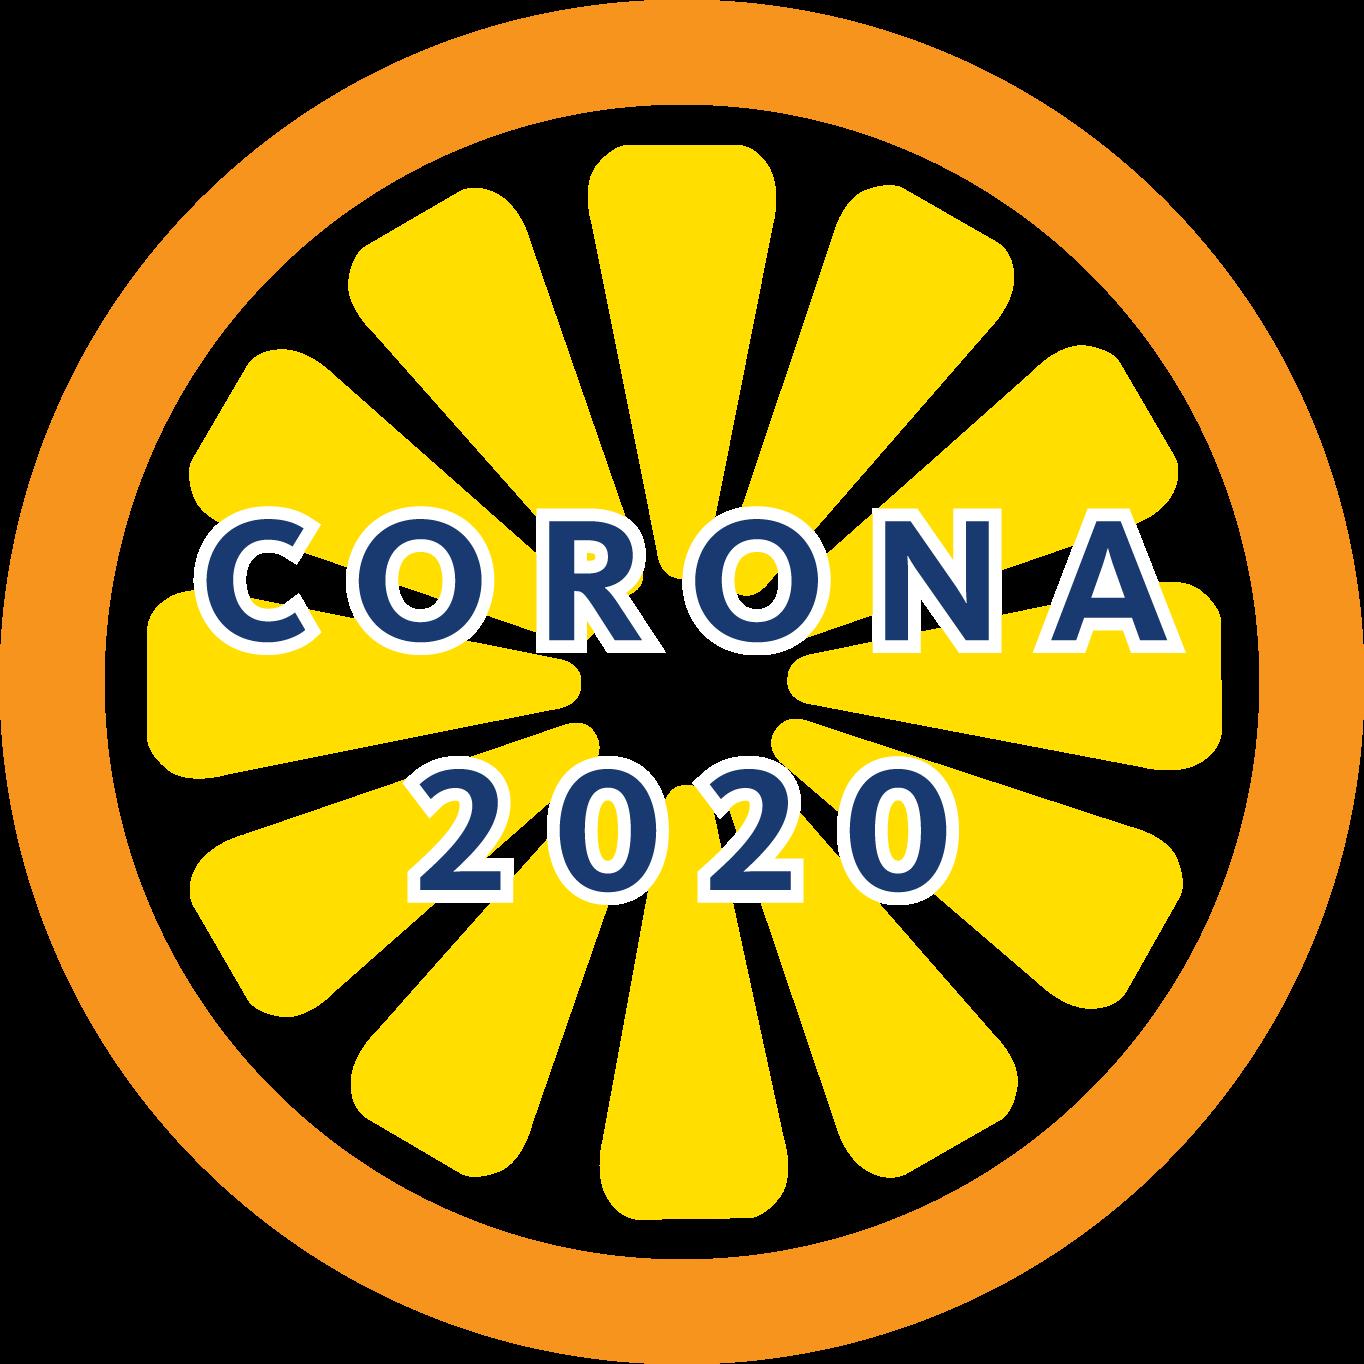 Corona-2020-logo.png